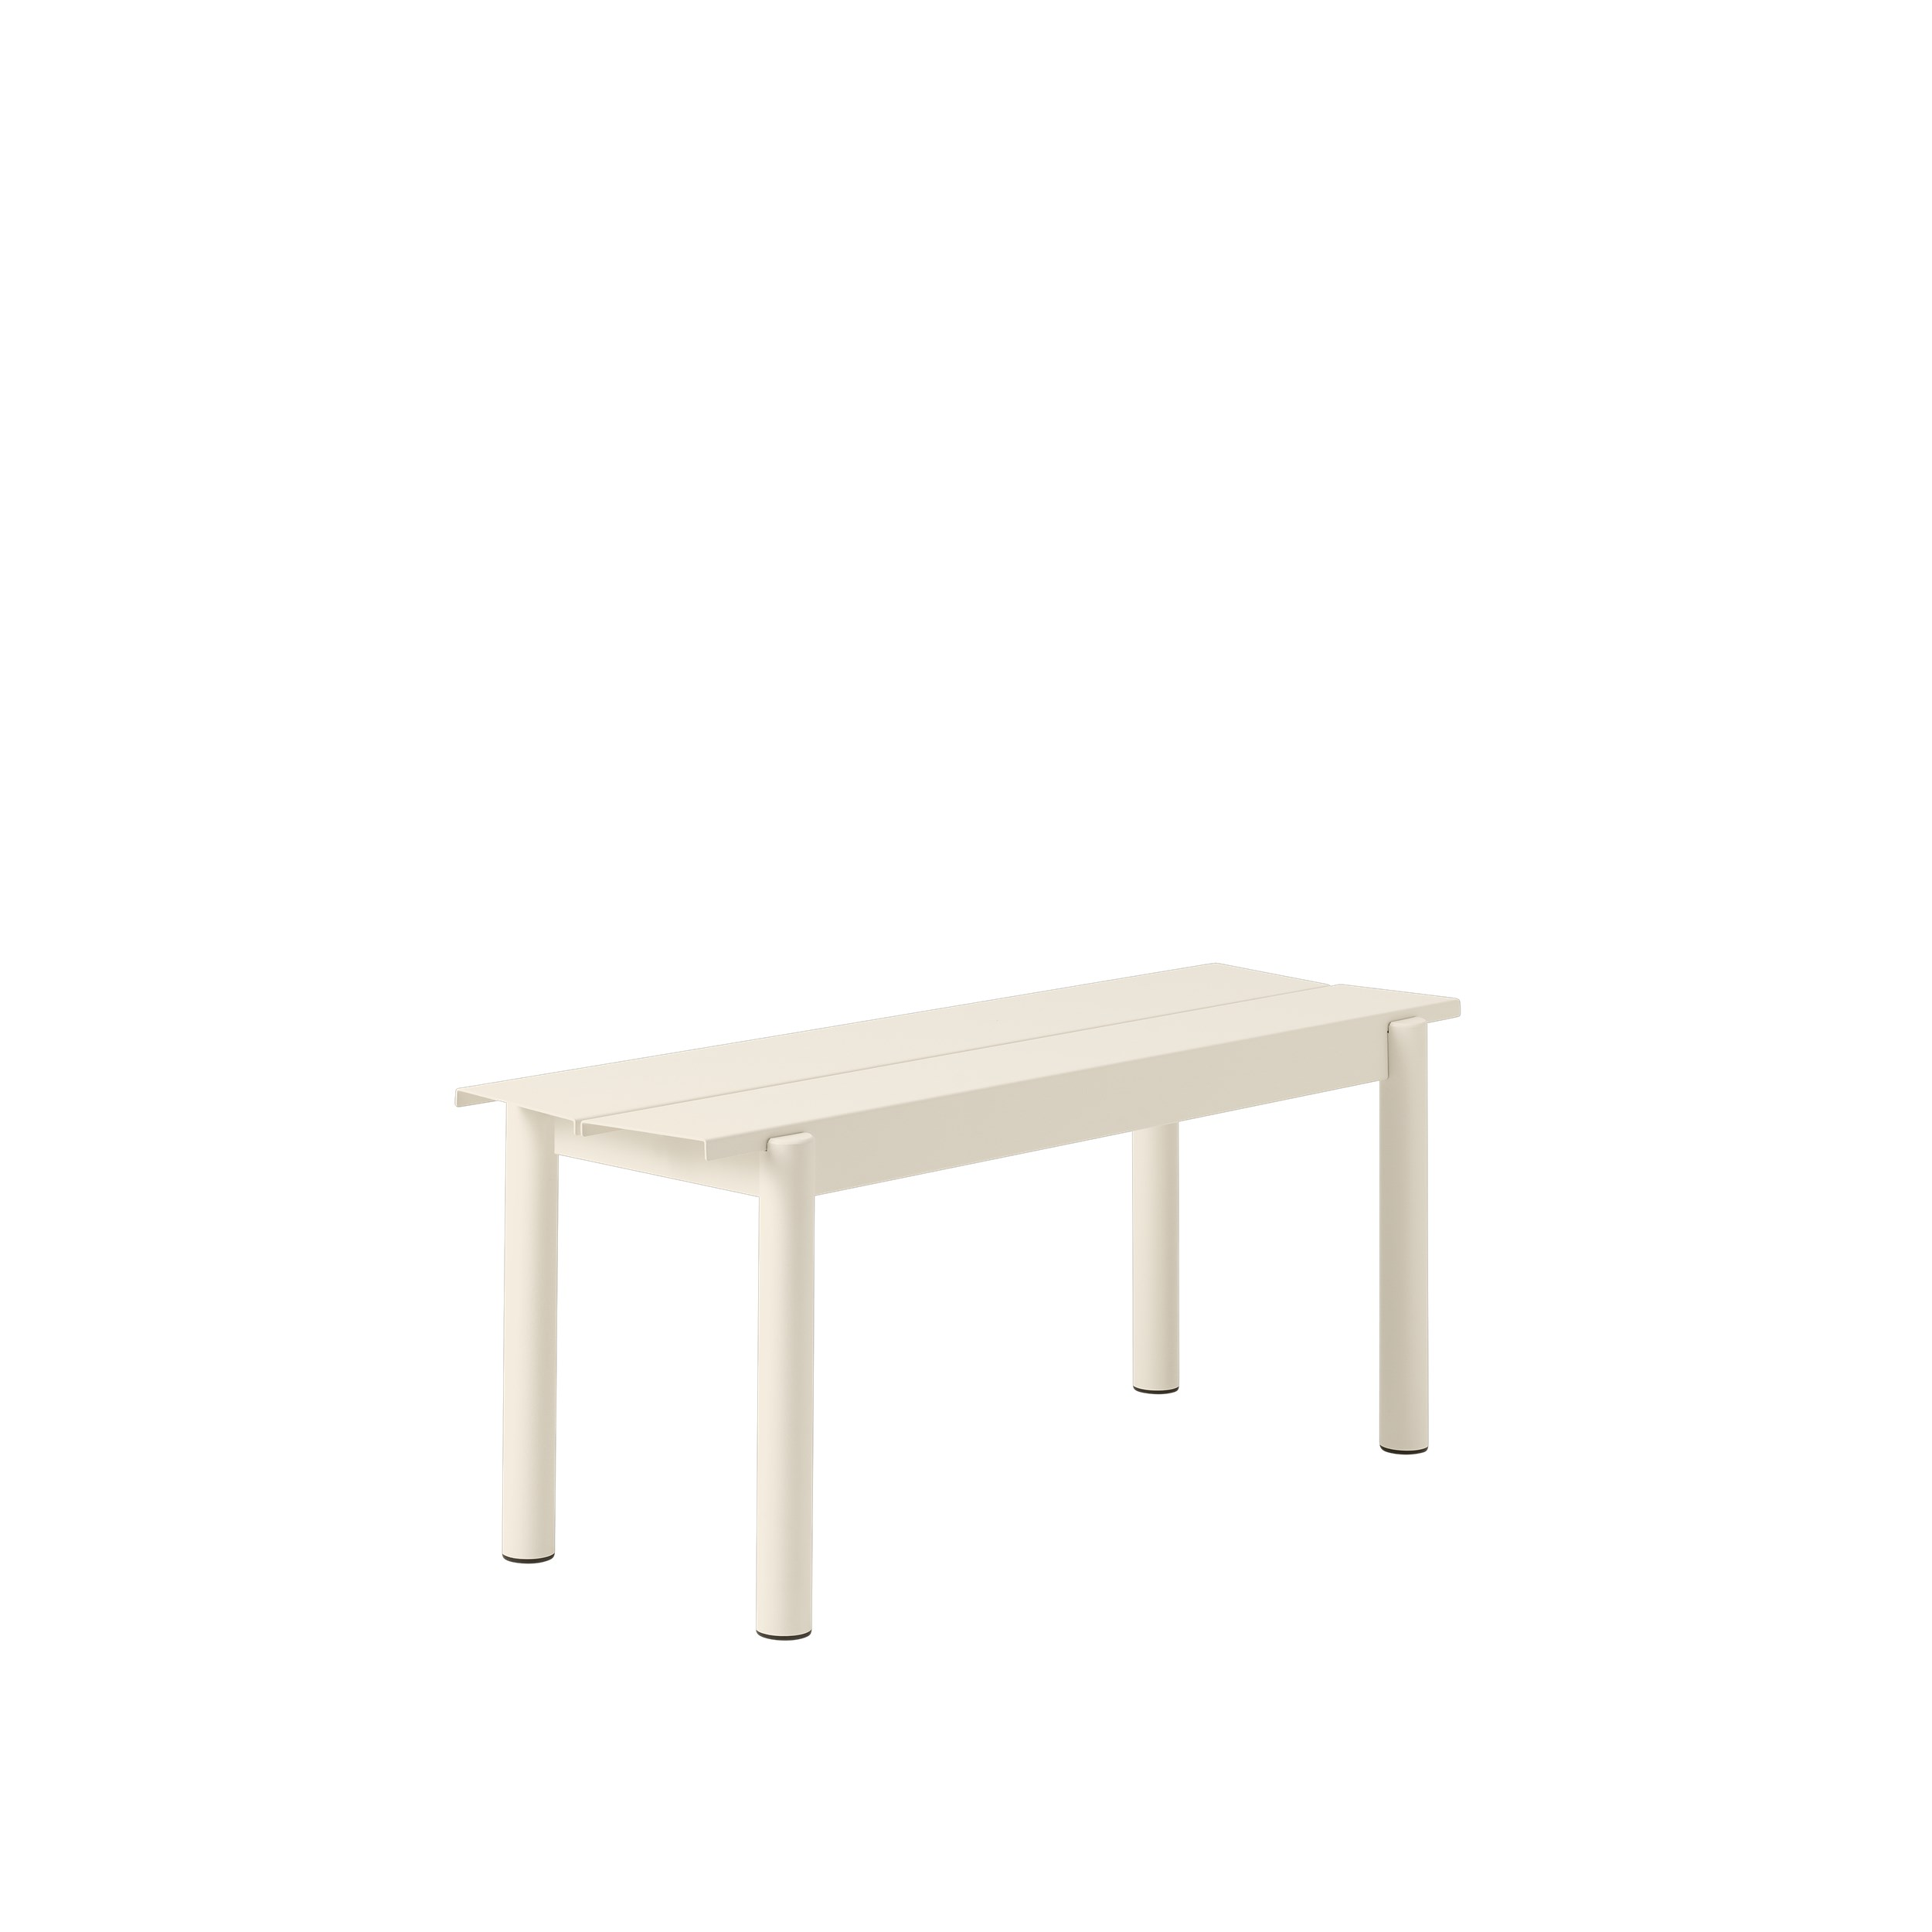 Muuto Linear Steel Bench 110 Off-white